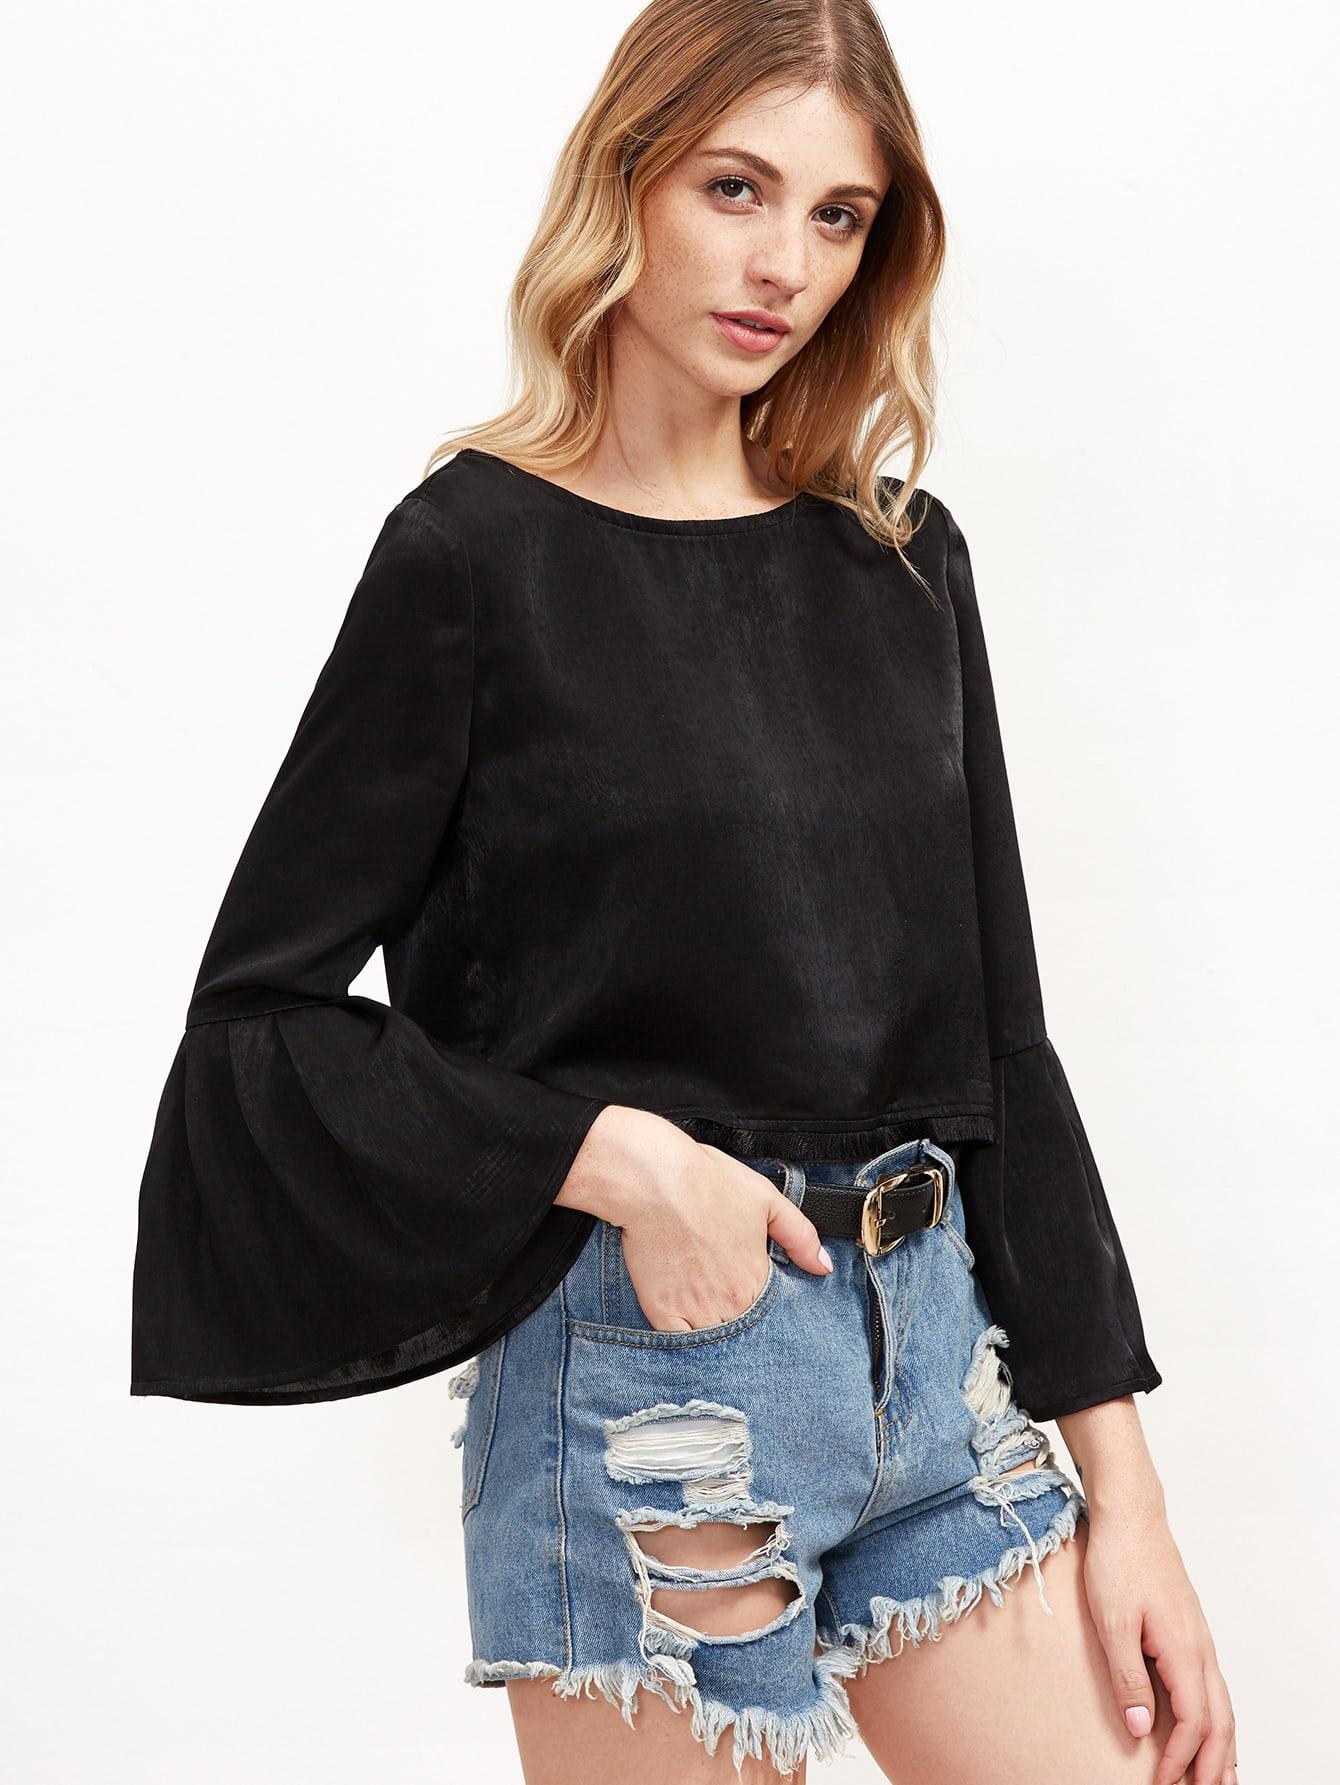 blouse161014702_2